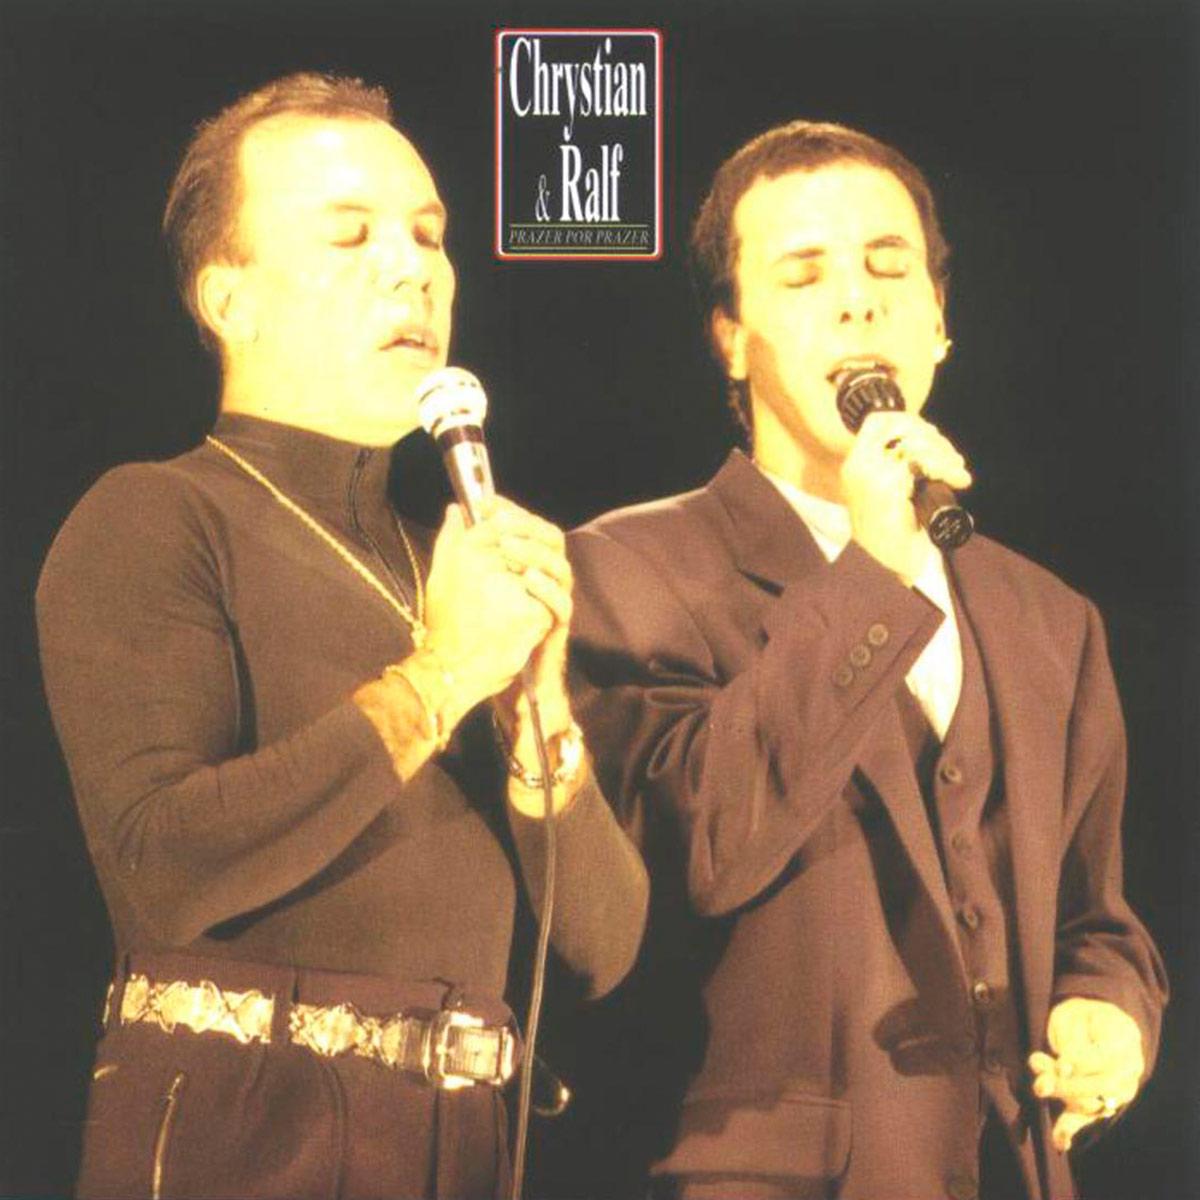 CD Chrystian & Ralf Prazer Por Prazer